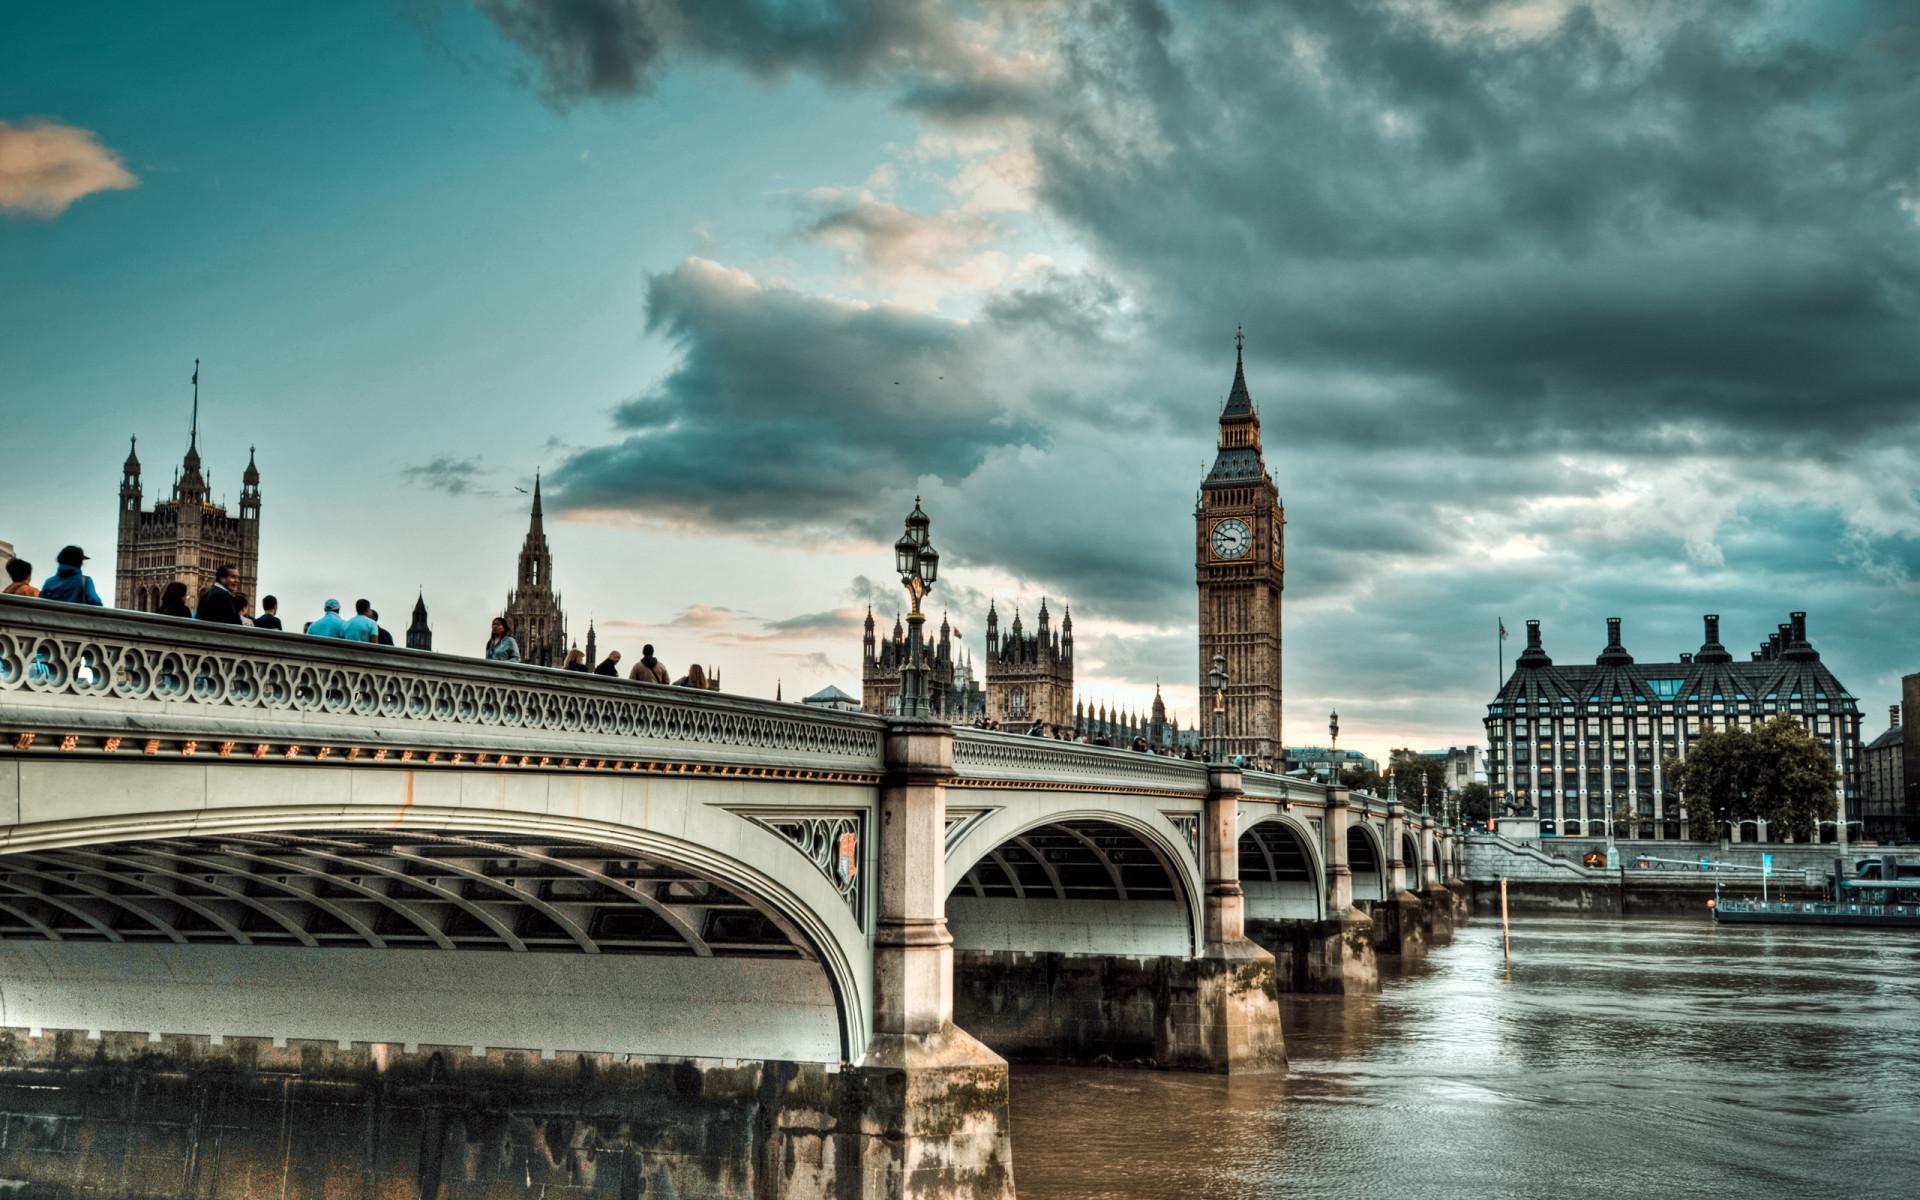 London Bridge Wallpaper 59 Images